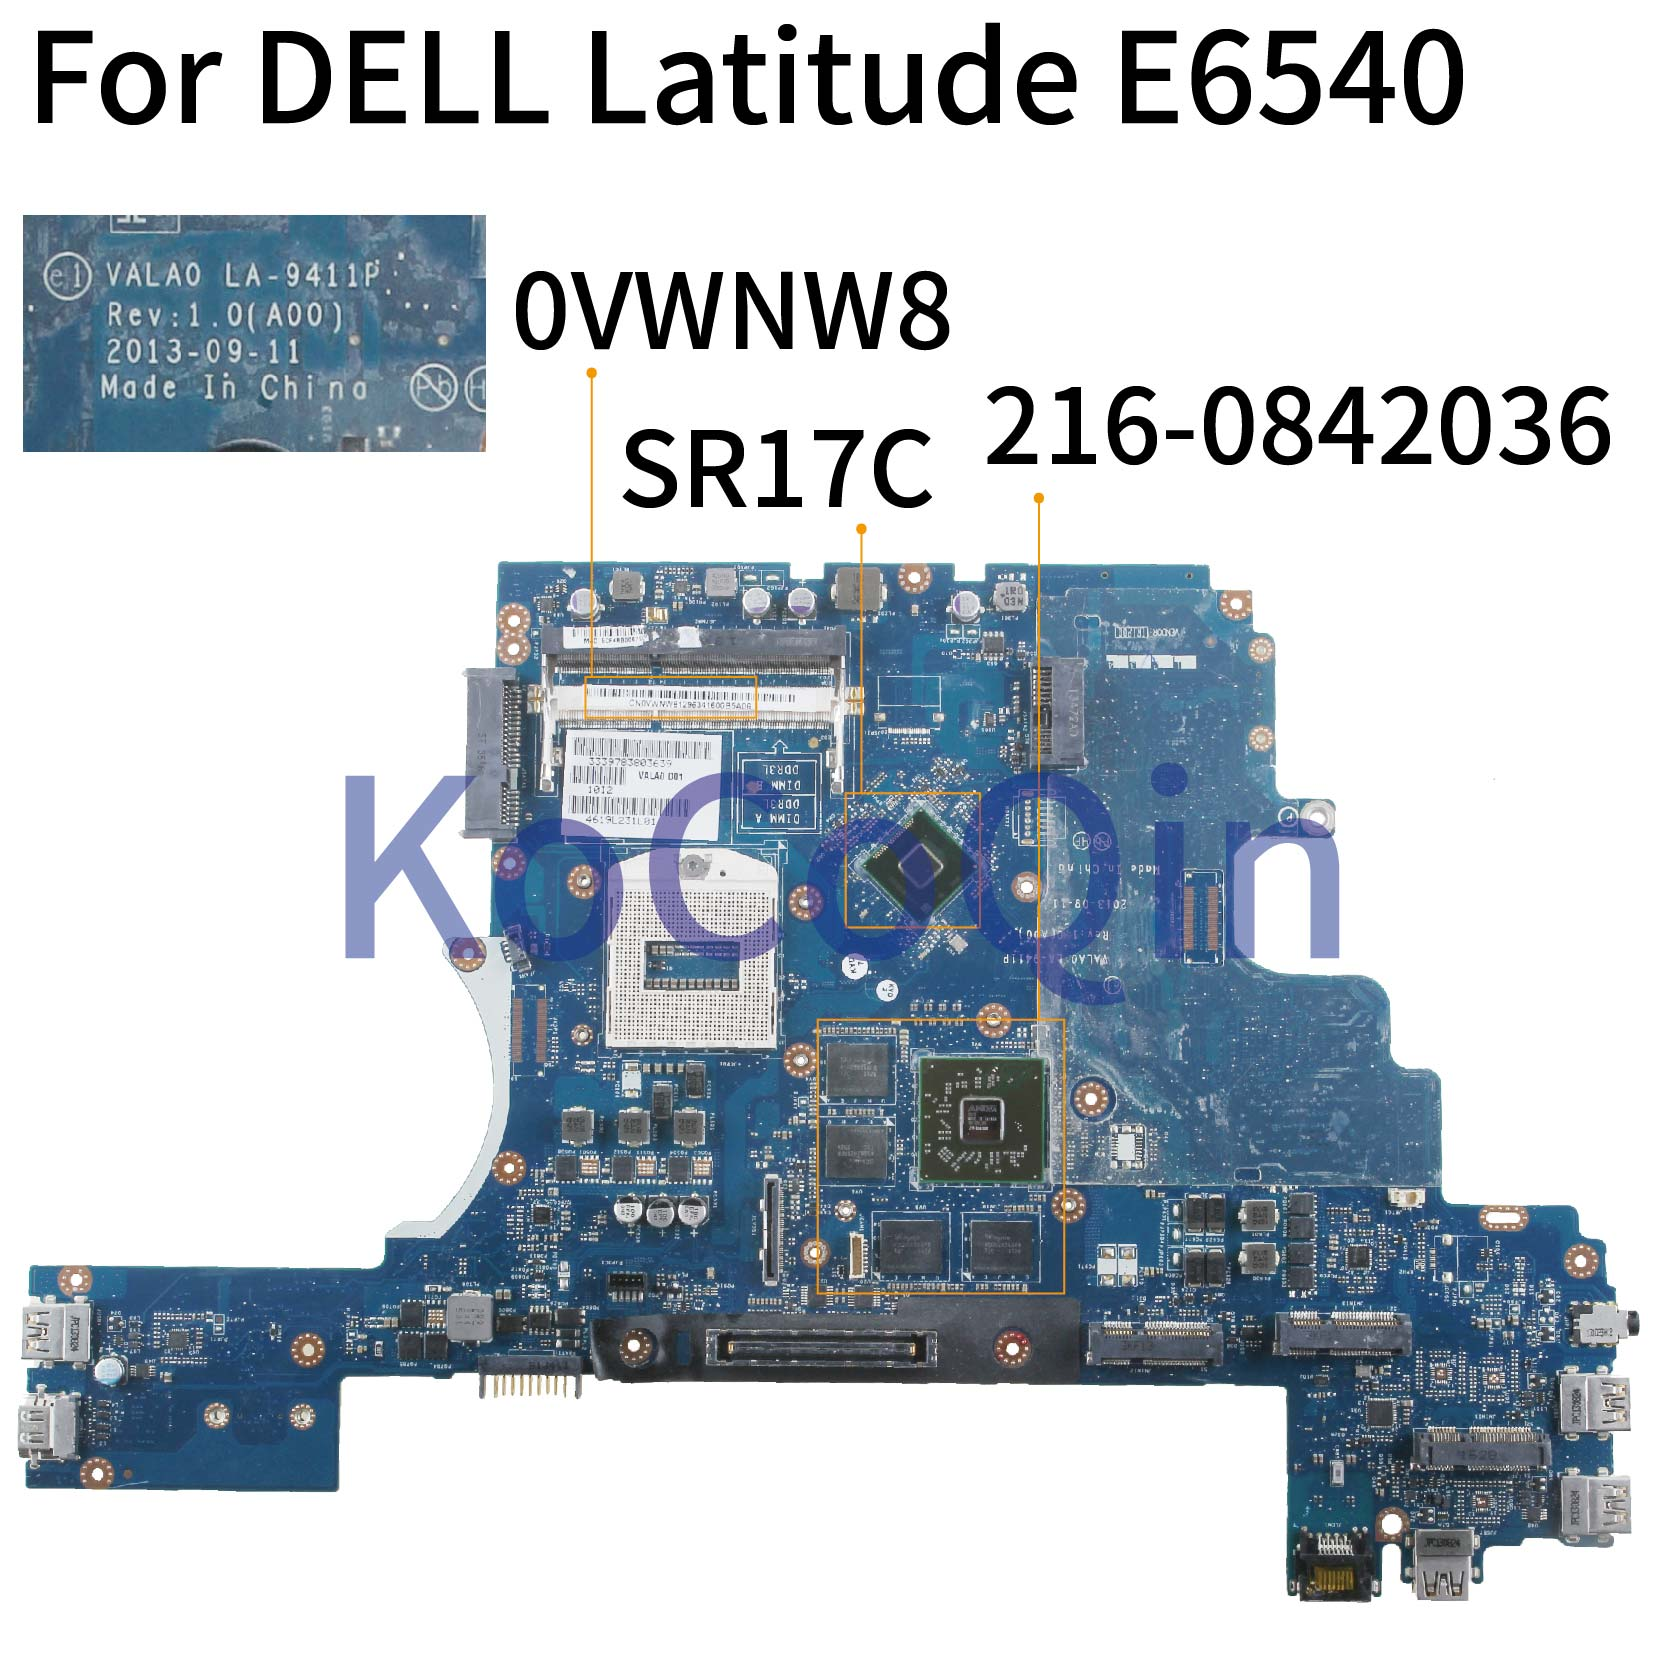 KoCoQin ноутбук материнская плата для Dell Latitude E6540 HD8790M 2G PGA947 материнская плата CN-0VWNW8 0VWNW8 VALA0 LA-9411P 216-0842036 SR17C